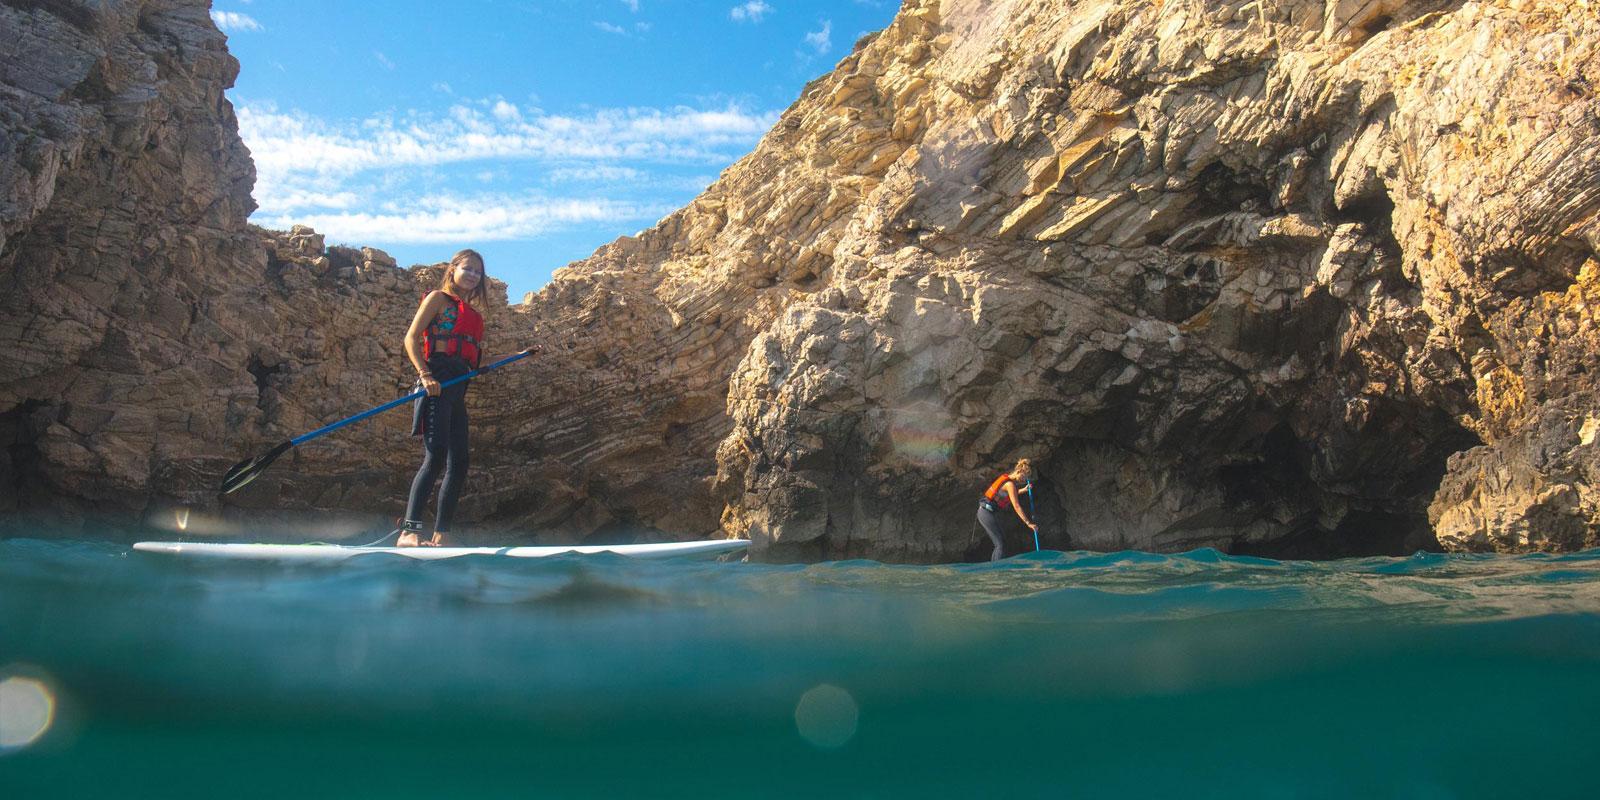 FUNRIDE Surfcamp and Surfschool